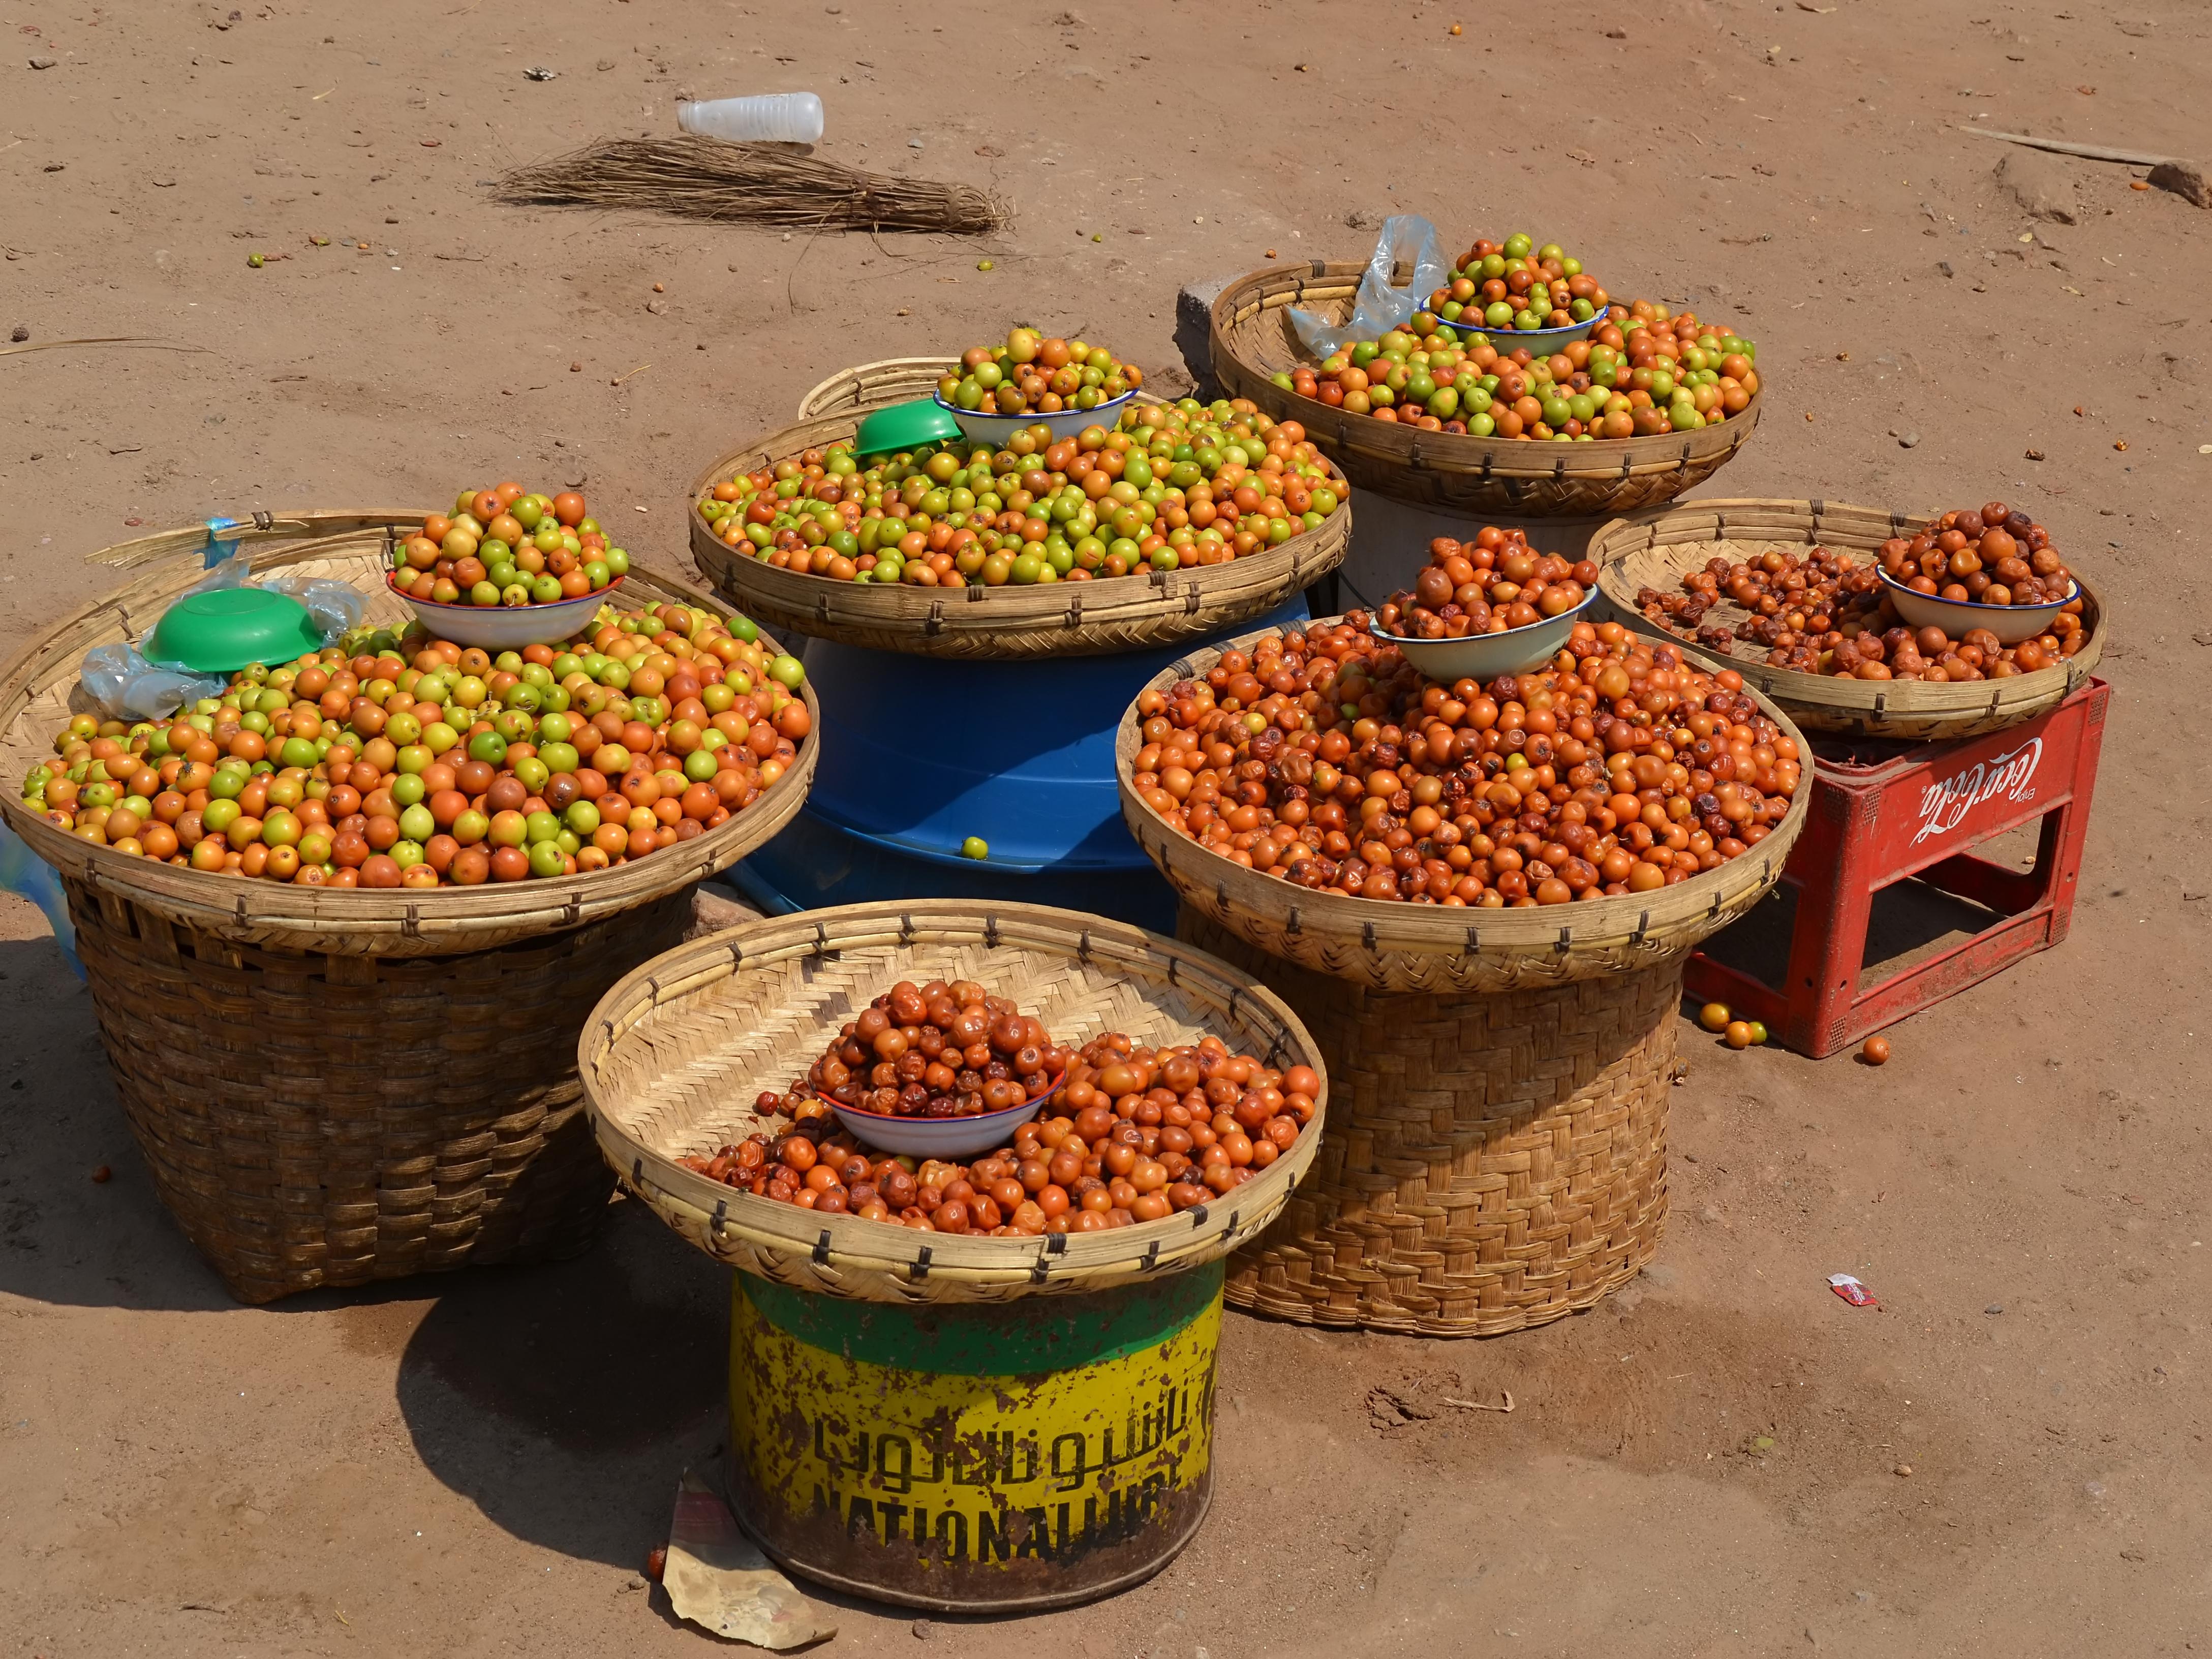 File:Ziziphus mauritiana (fruits sale) jpg - Wikimedia Commons